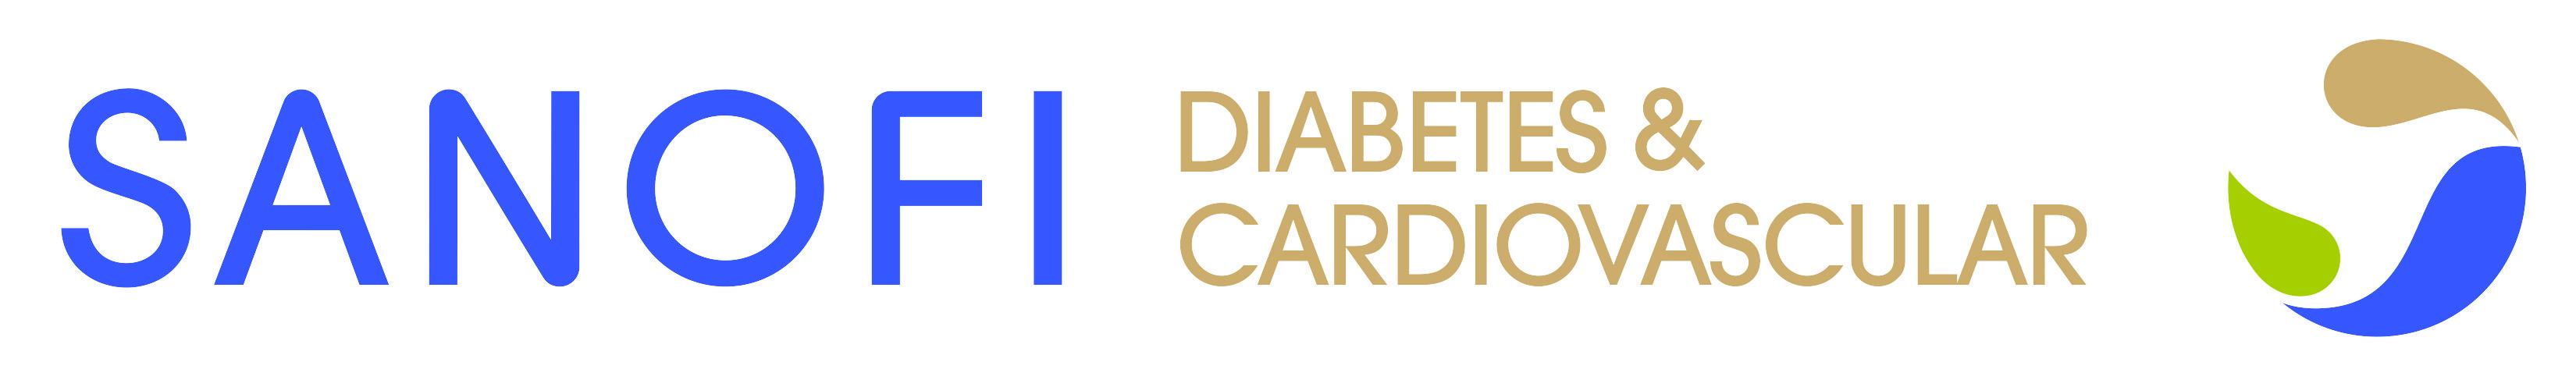 SANOFI_Diabetes_Cardiovascular_Colour21470361741.jpg